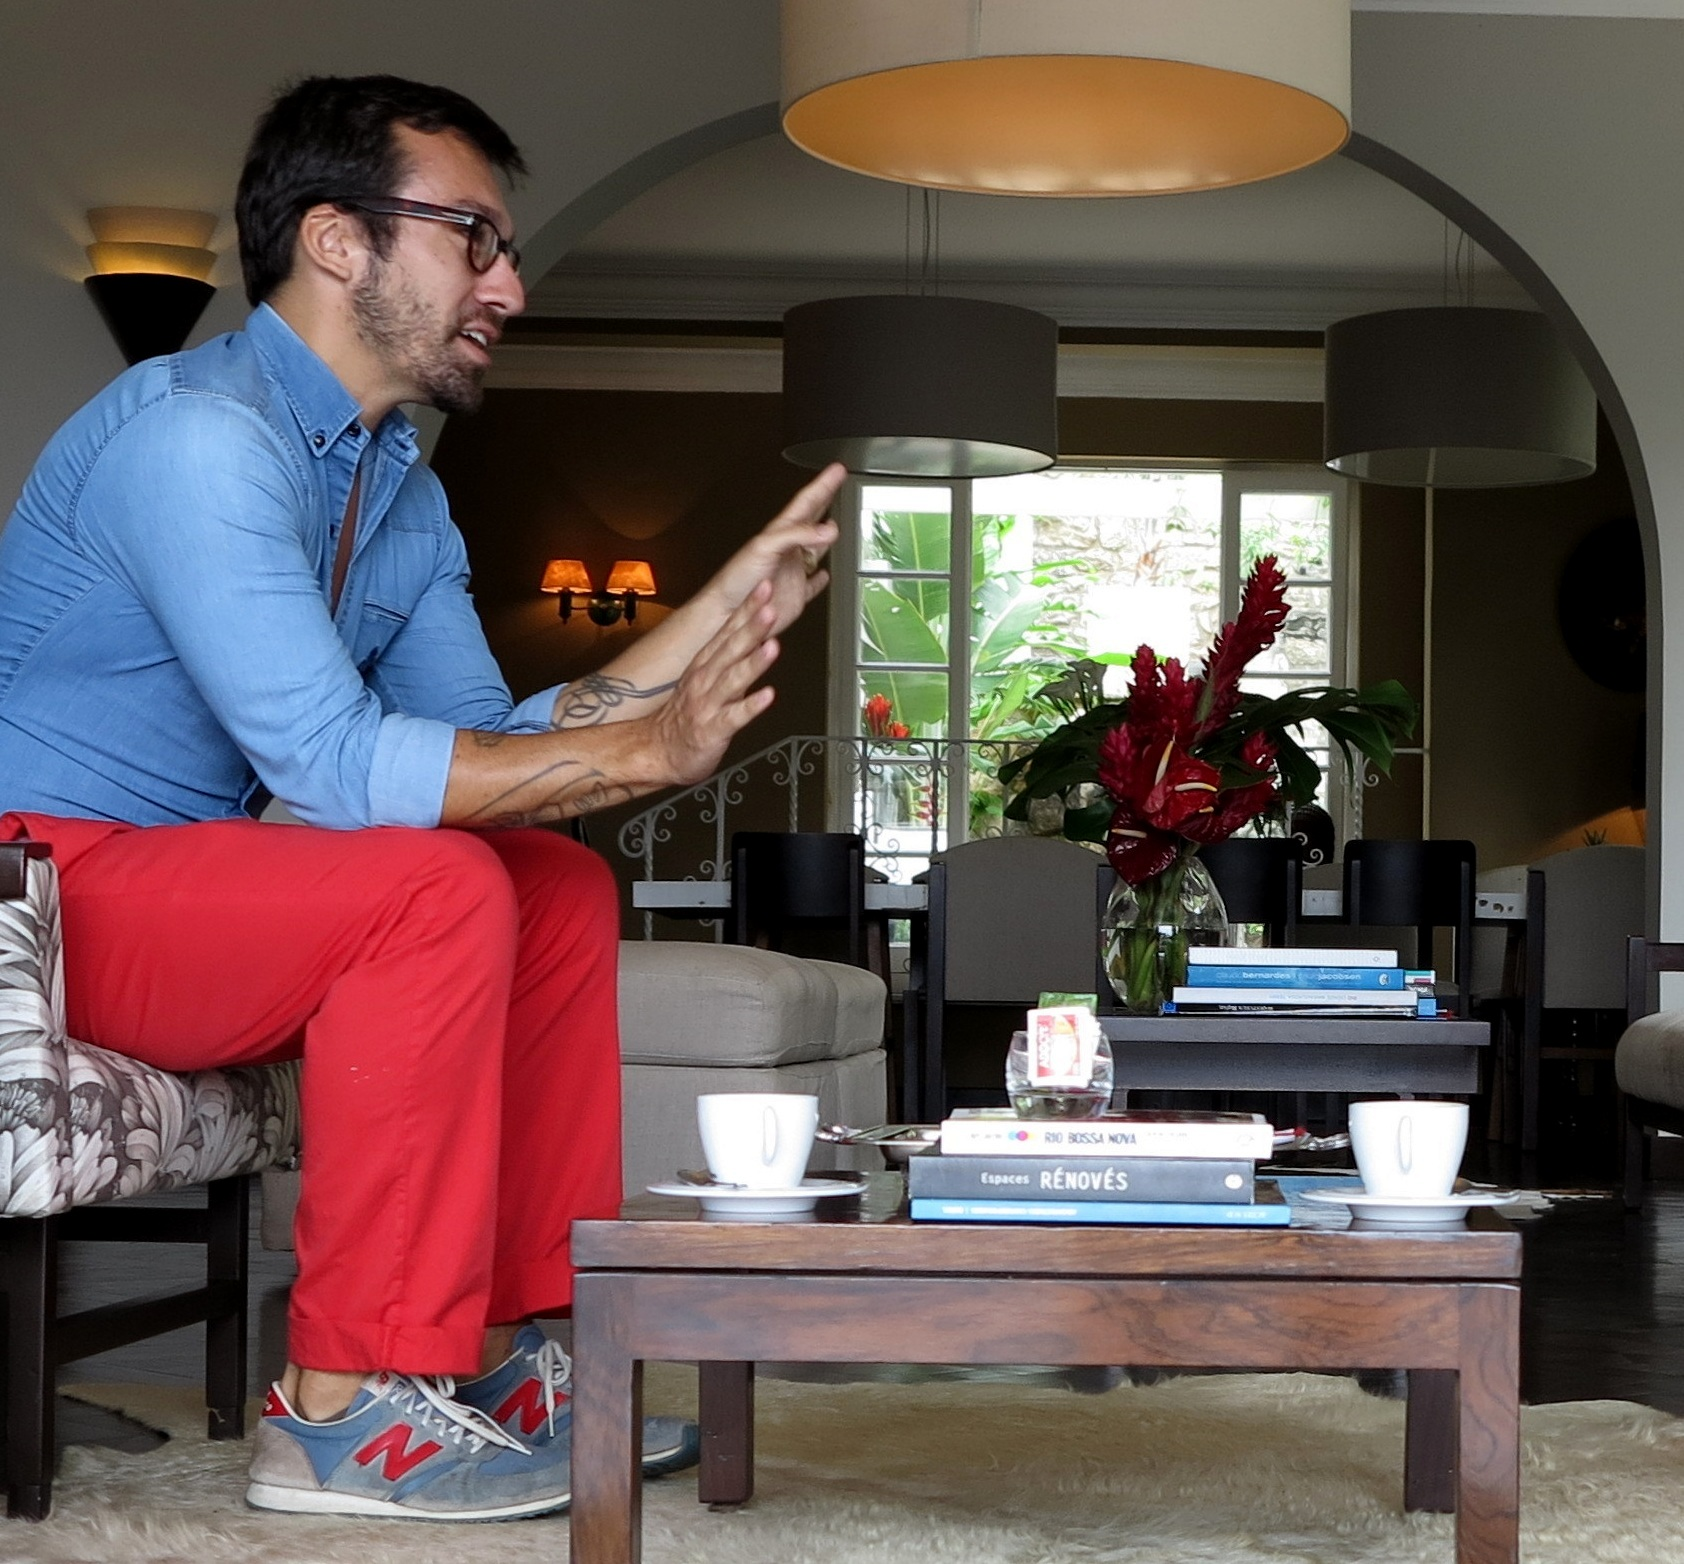 Meeting benjamin cano entrepreneur with an ideological - Benjamin cano arquitecto ...